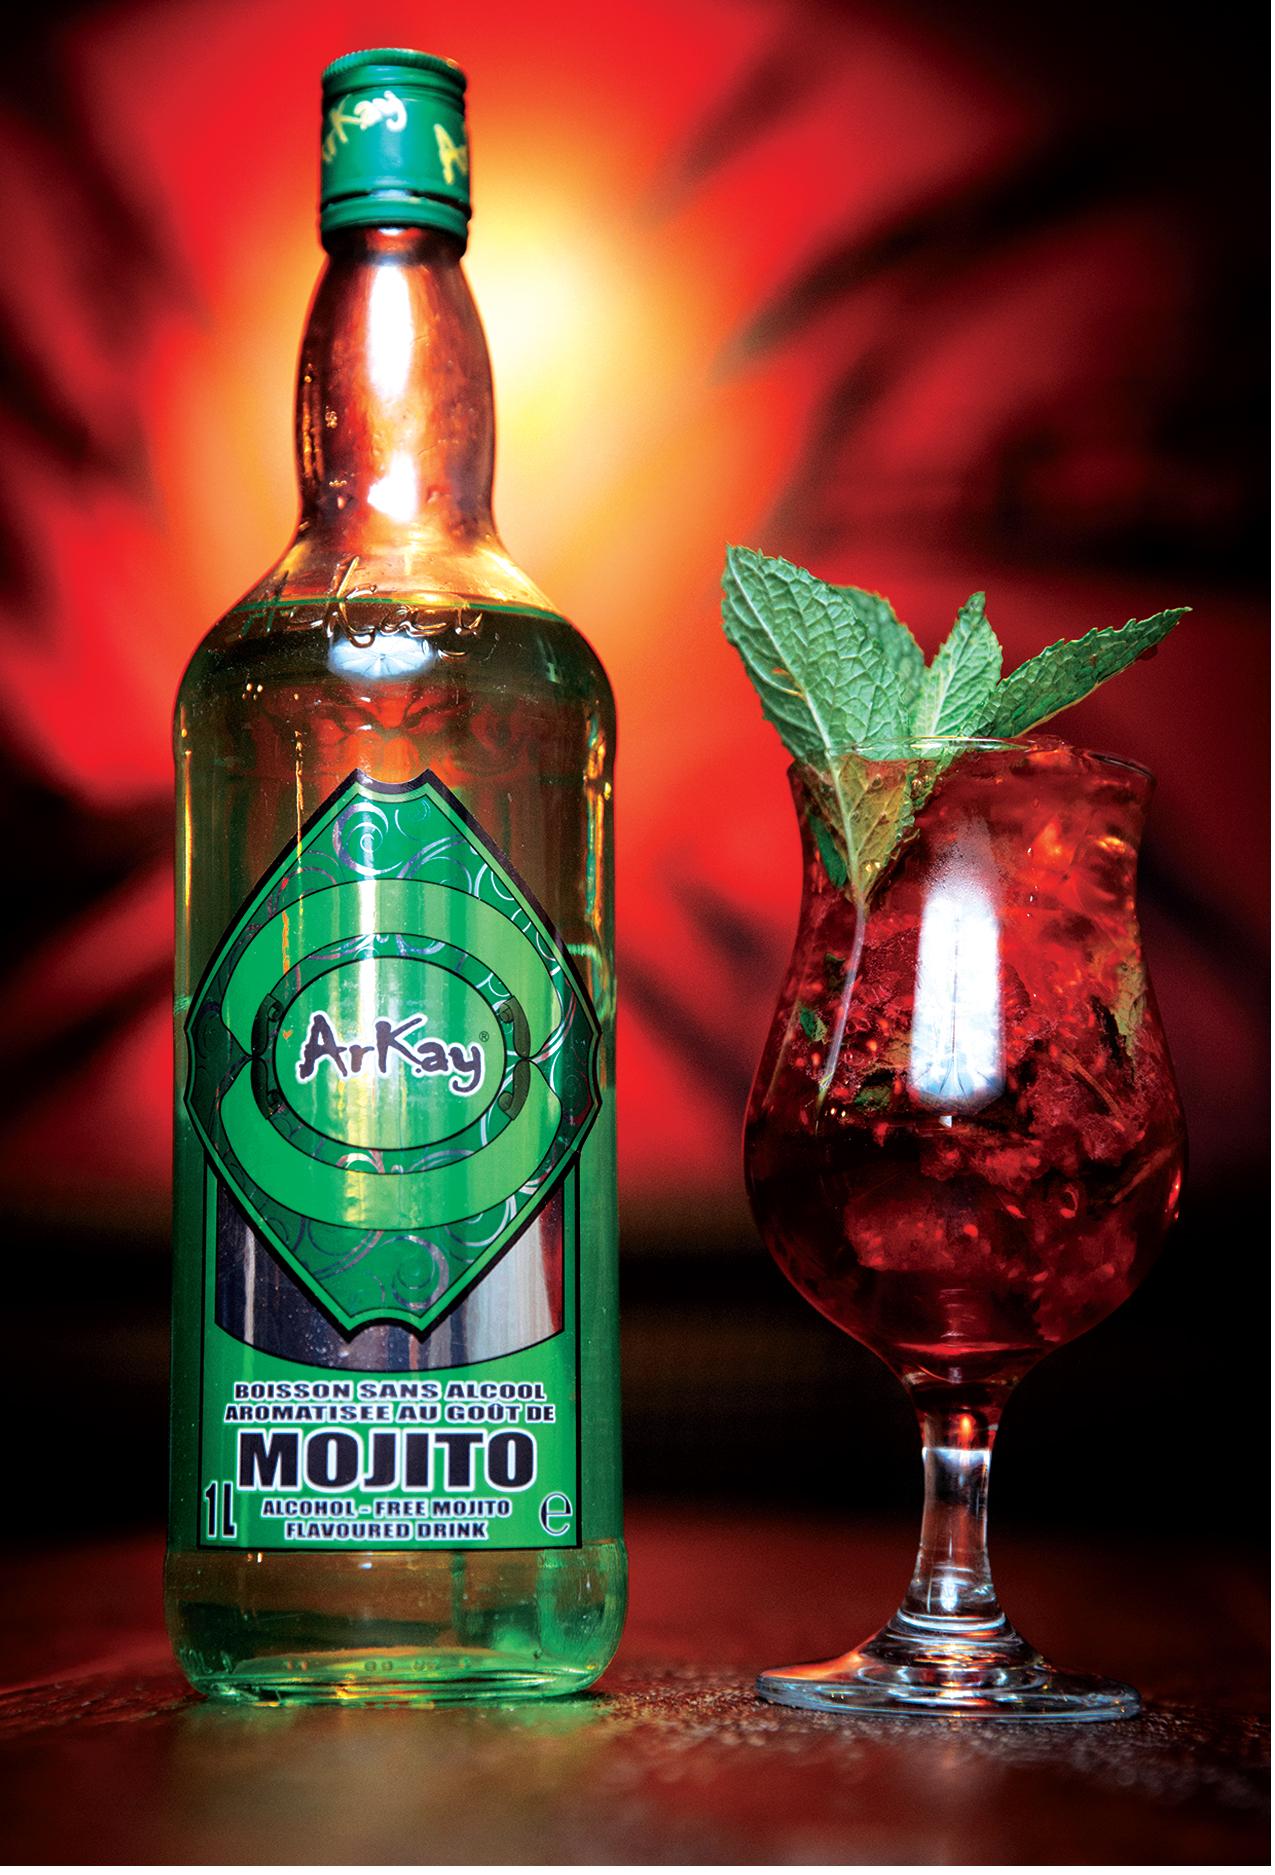 Mojito Mocktail: Arkay raspberry nojito